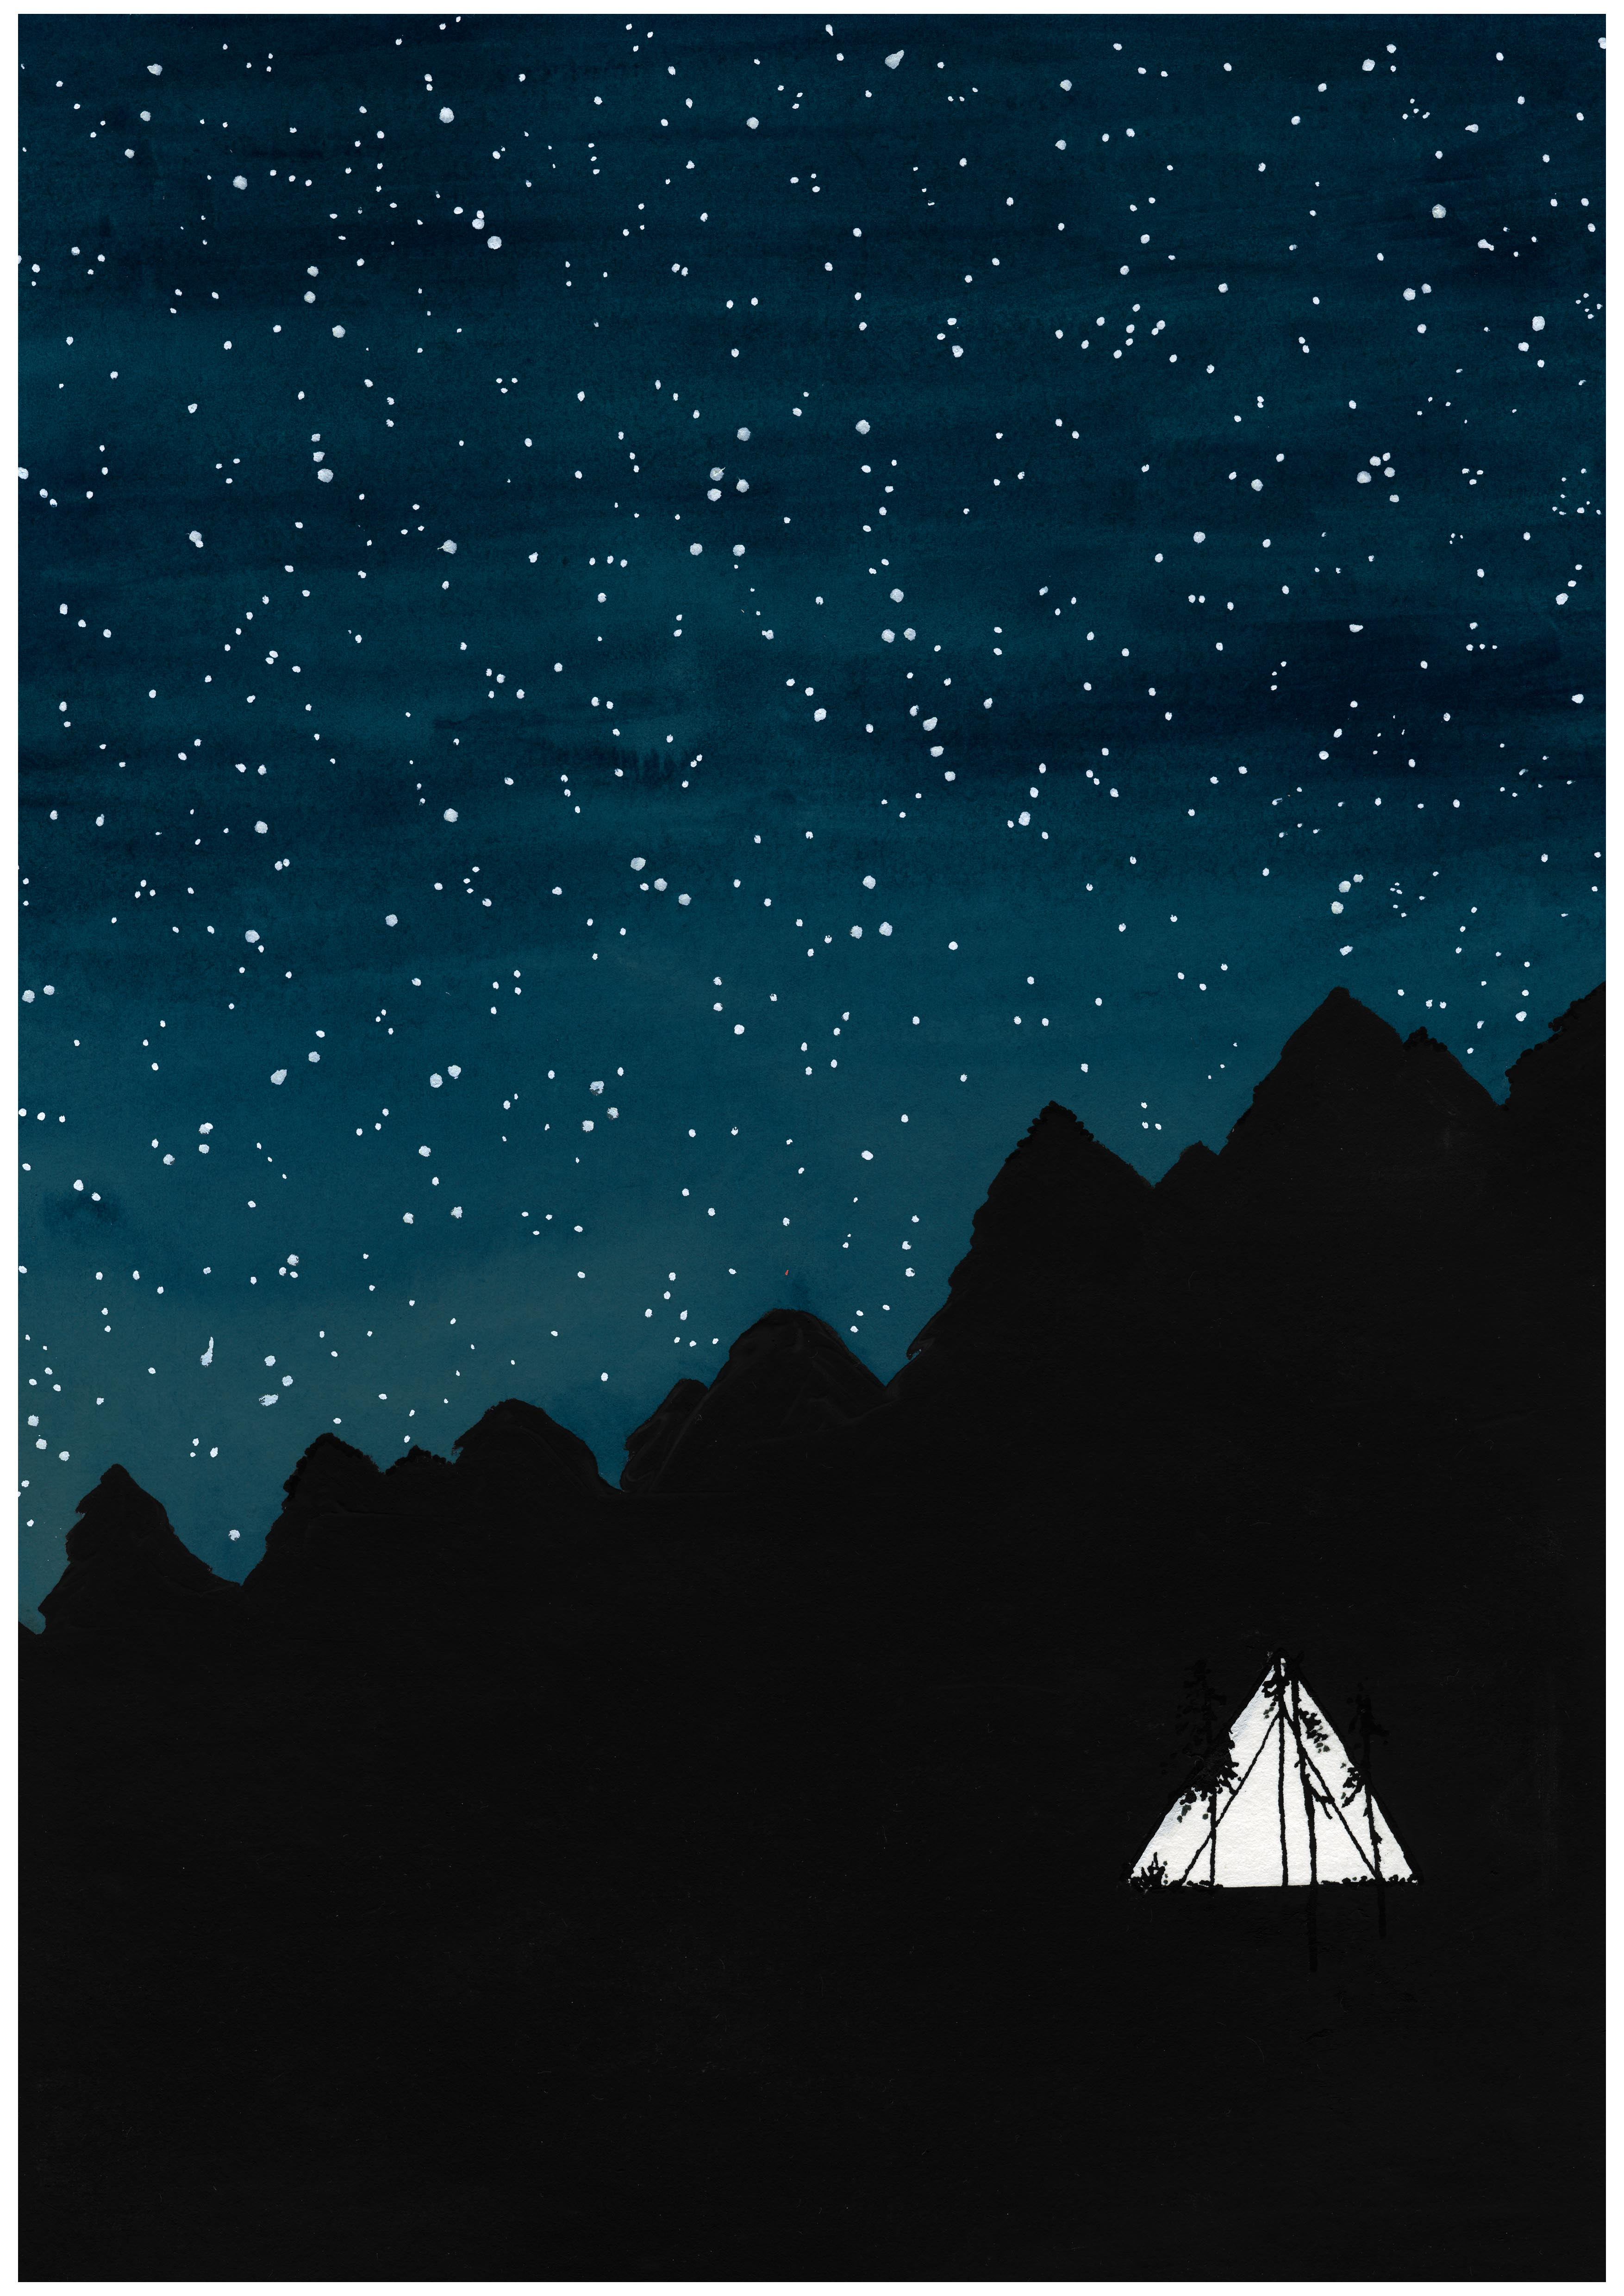 Tent night (2 sizes)